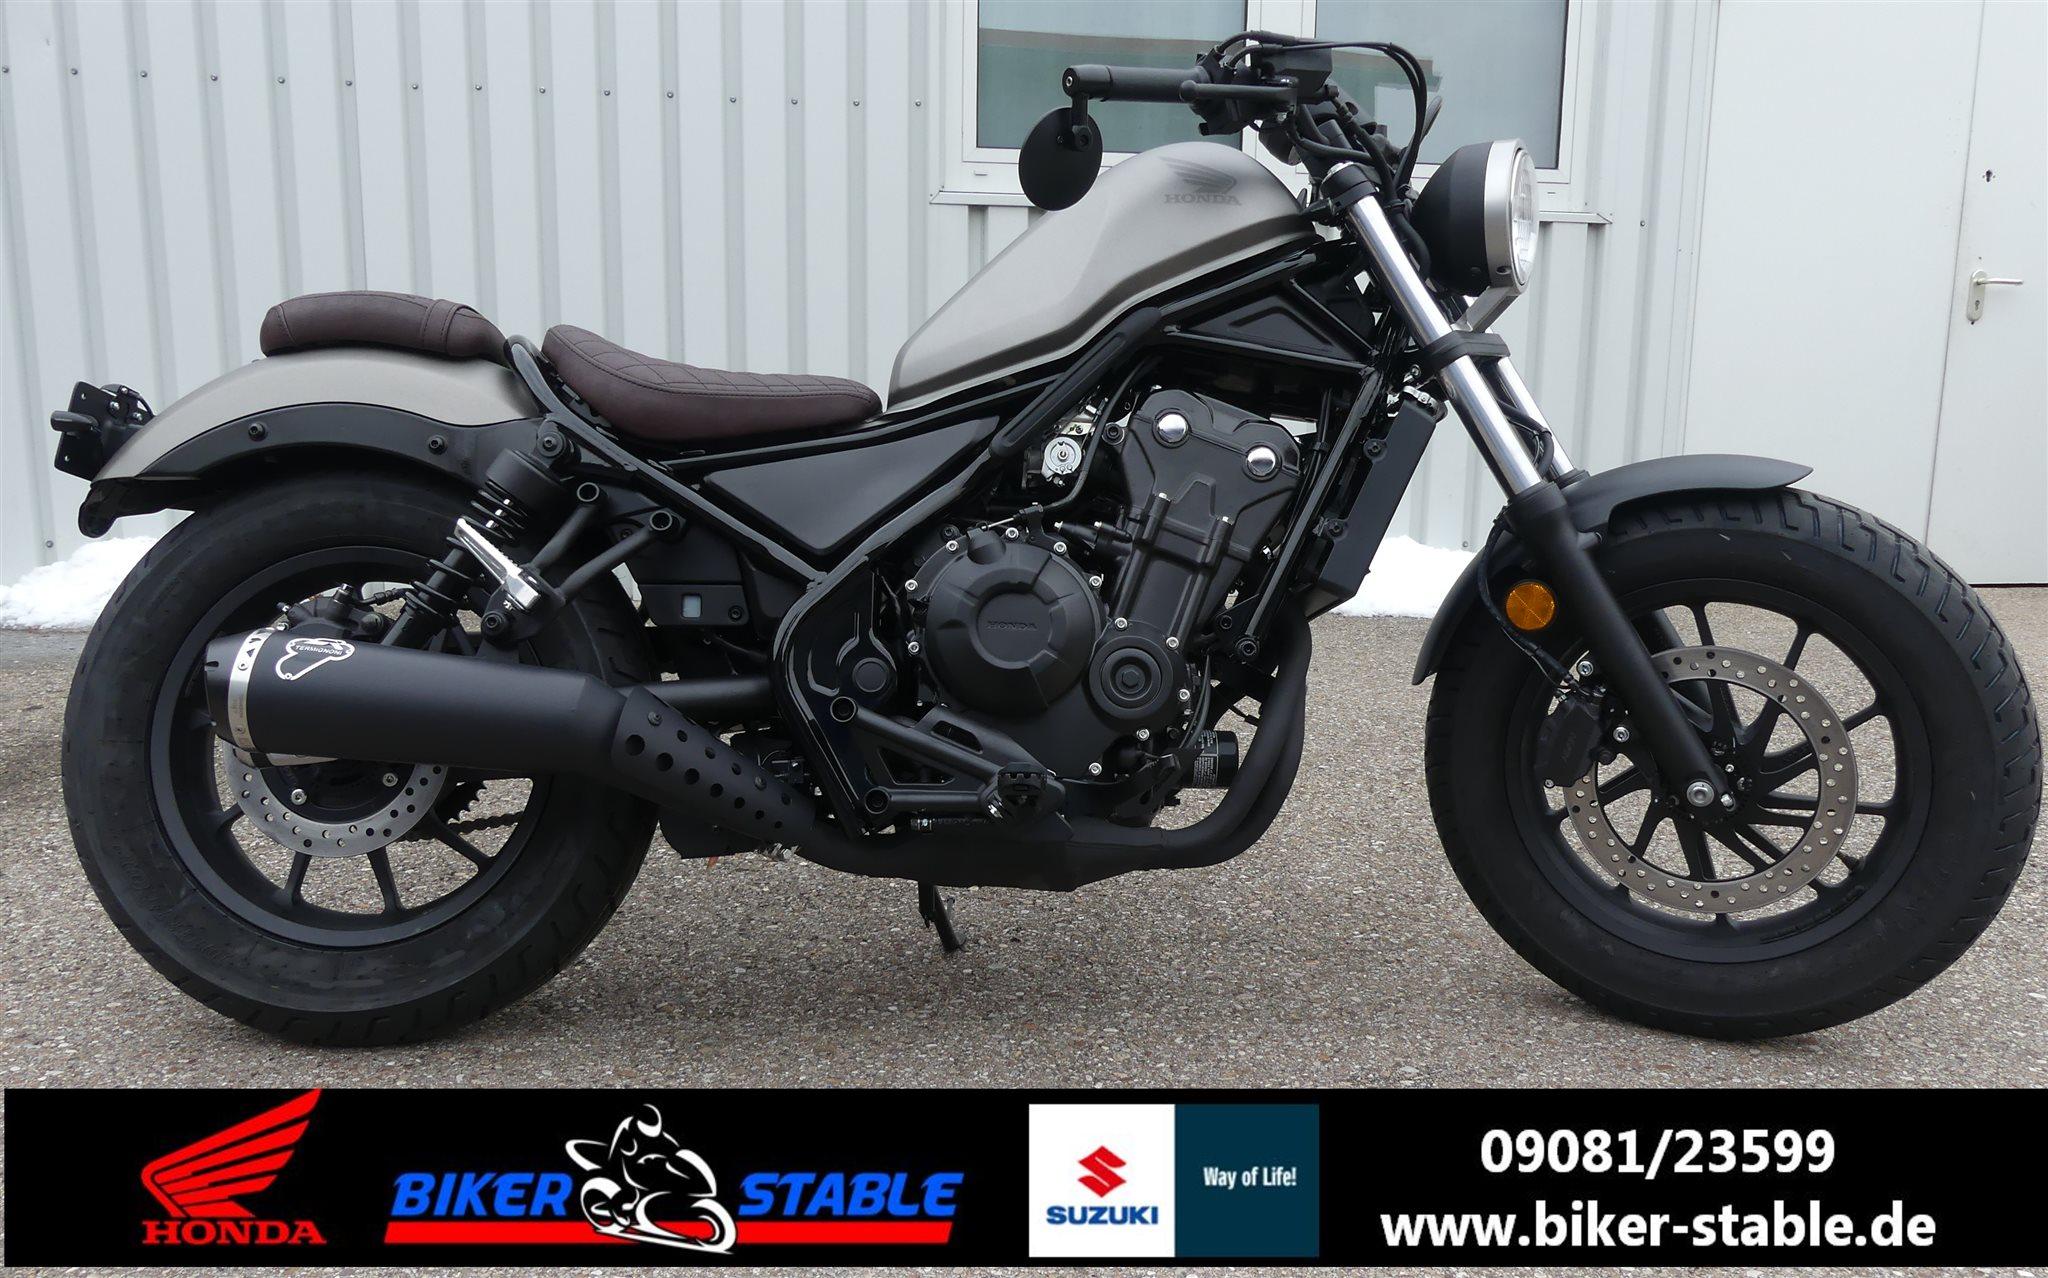 umgebautes motorrad honda cmx500 rebel von biker stable. Black Bedroom Furniture Sets. Home Design Ideas